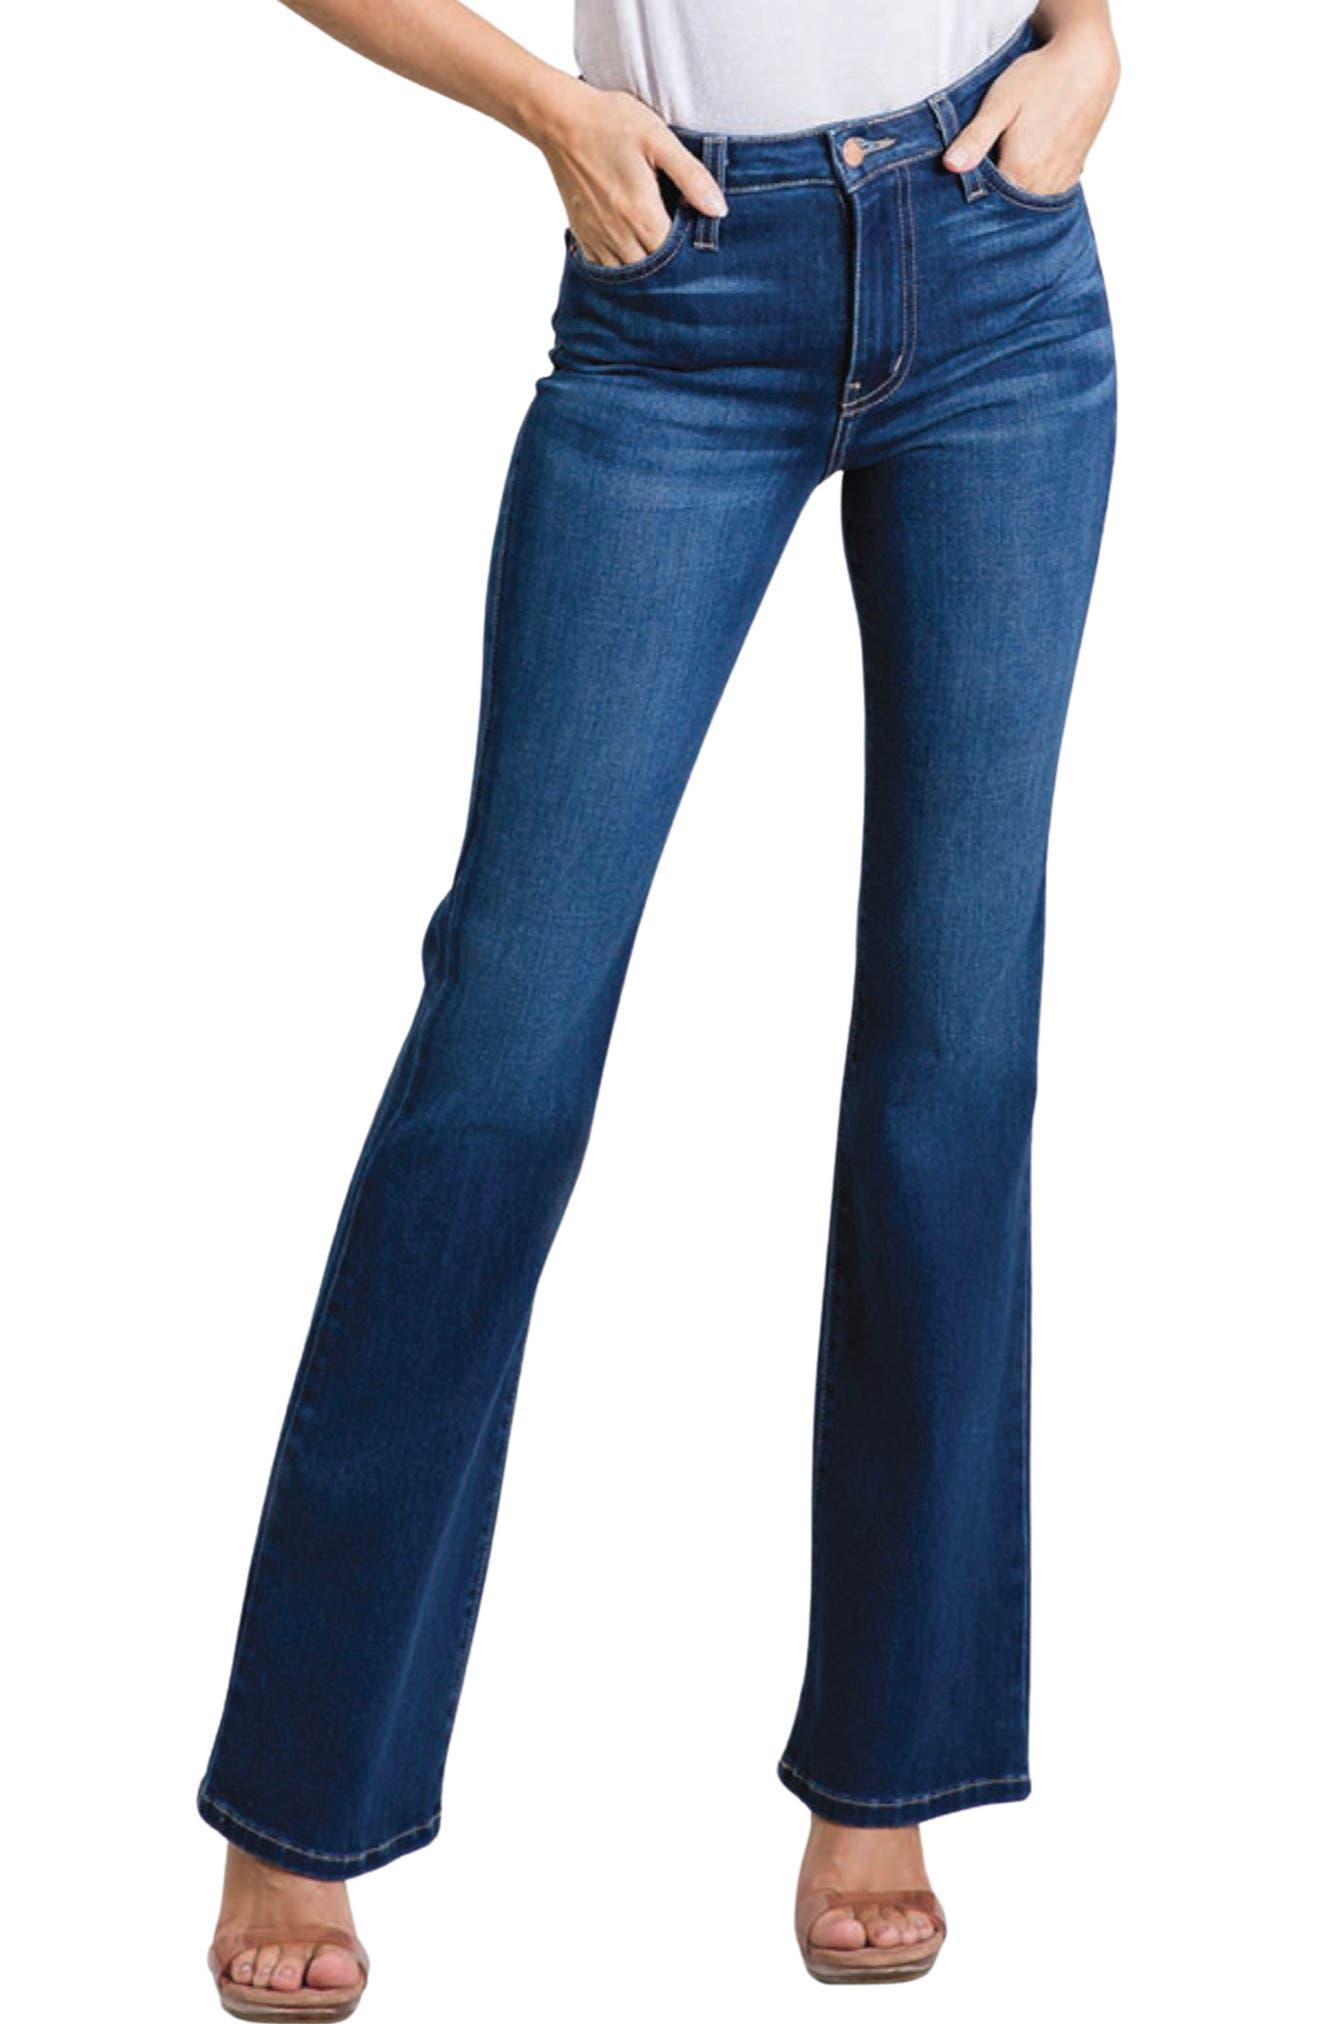 L.T.J. Women's L.T.J Florence Classic Bootcut Jeans